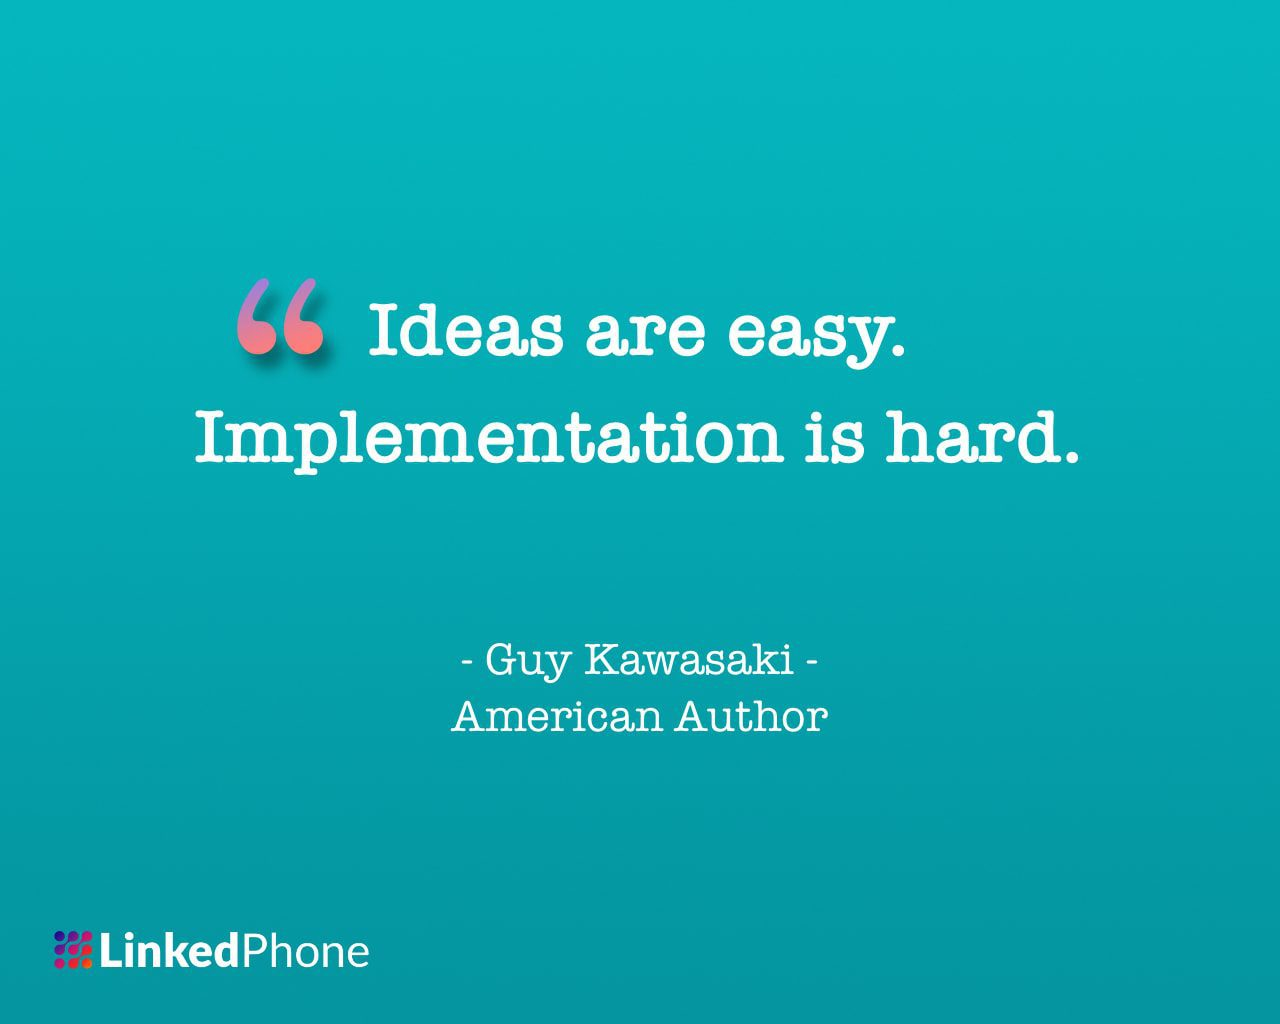 Guy Kawasaki - Motivational Inspirational Quotes and Sayings